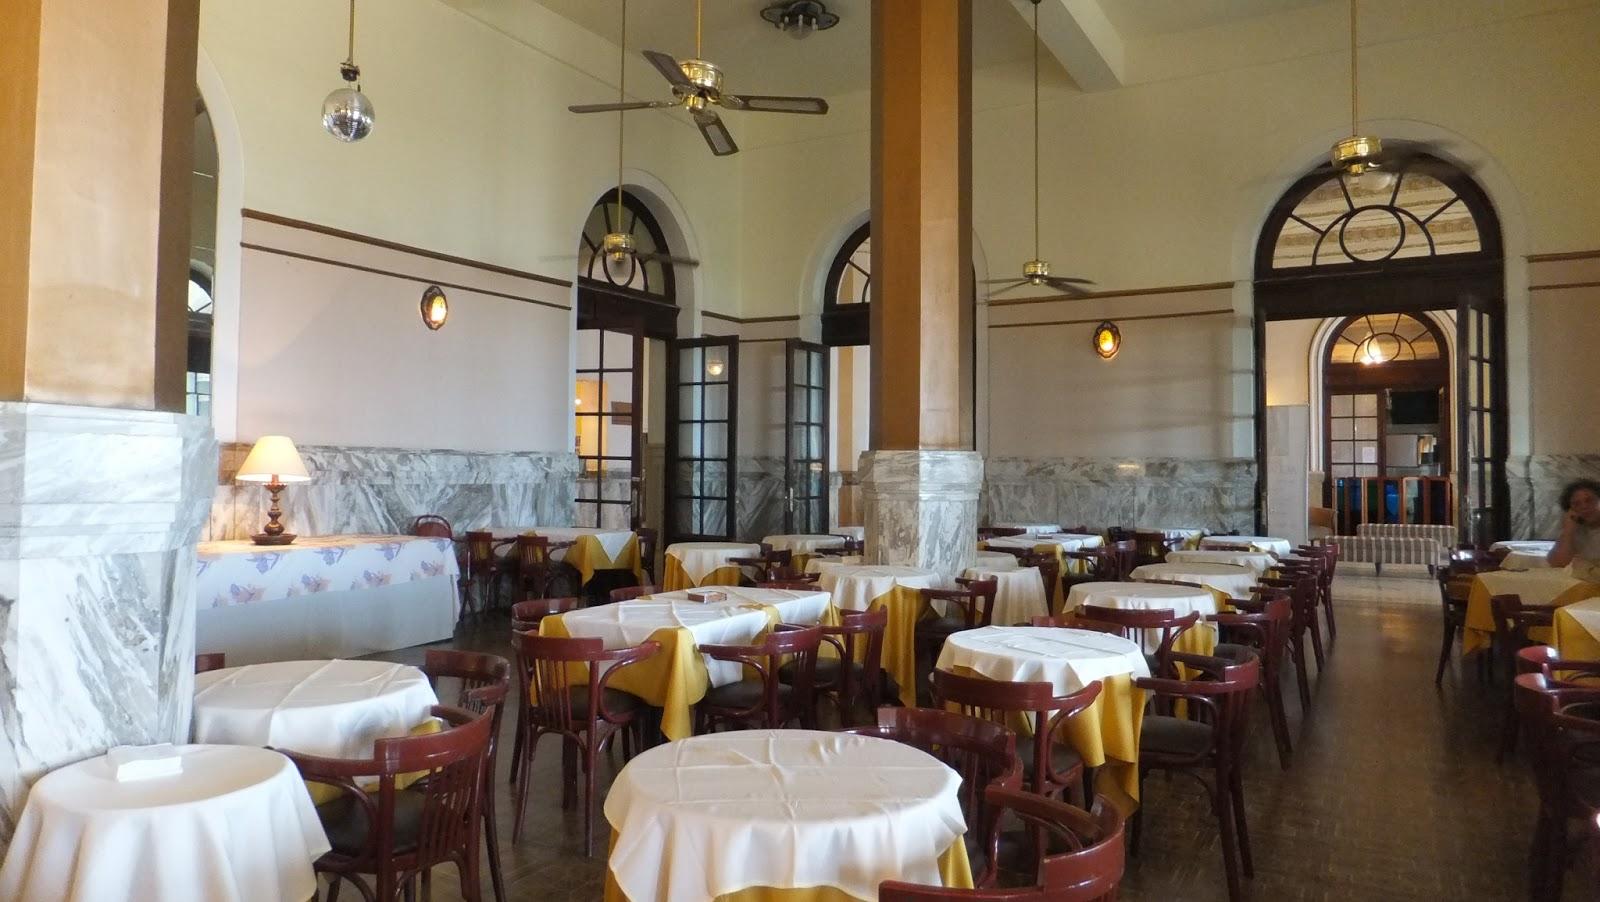 Argentino Hotel en Piriápolis, Uruguay, Elisa N, Blog de Viajes, Lifestyle, Travel